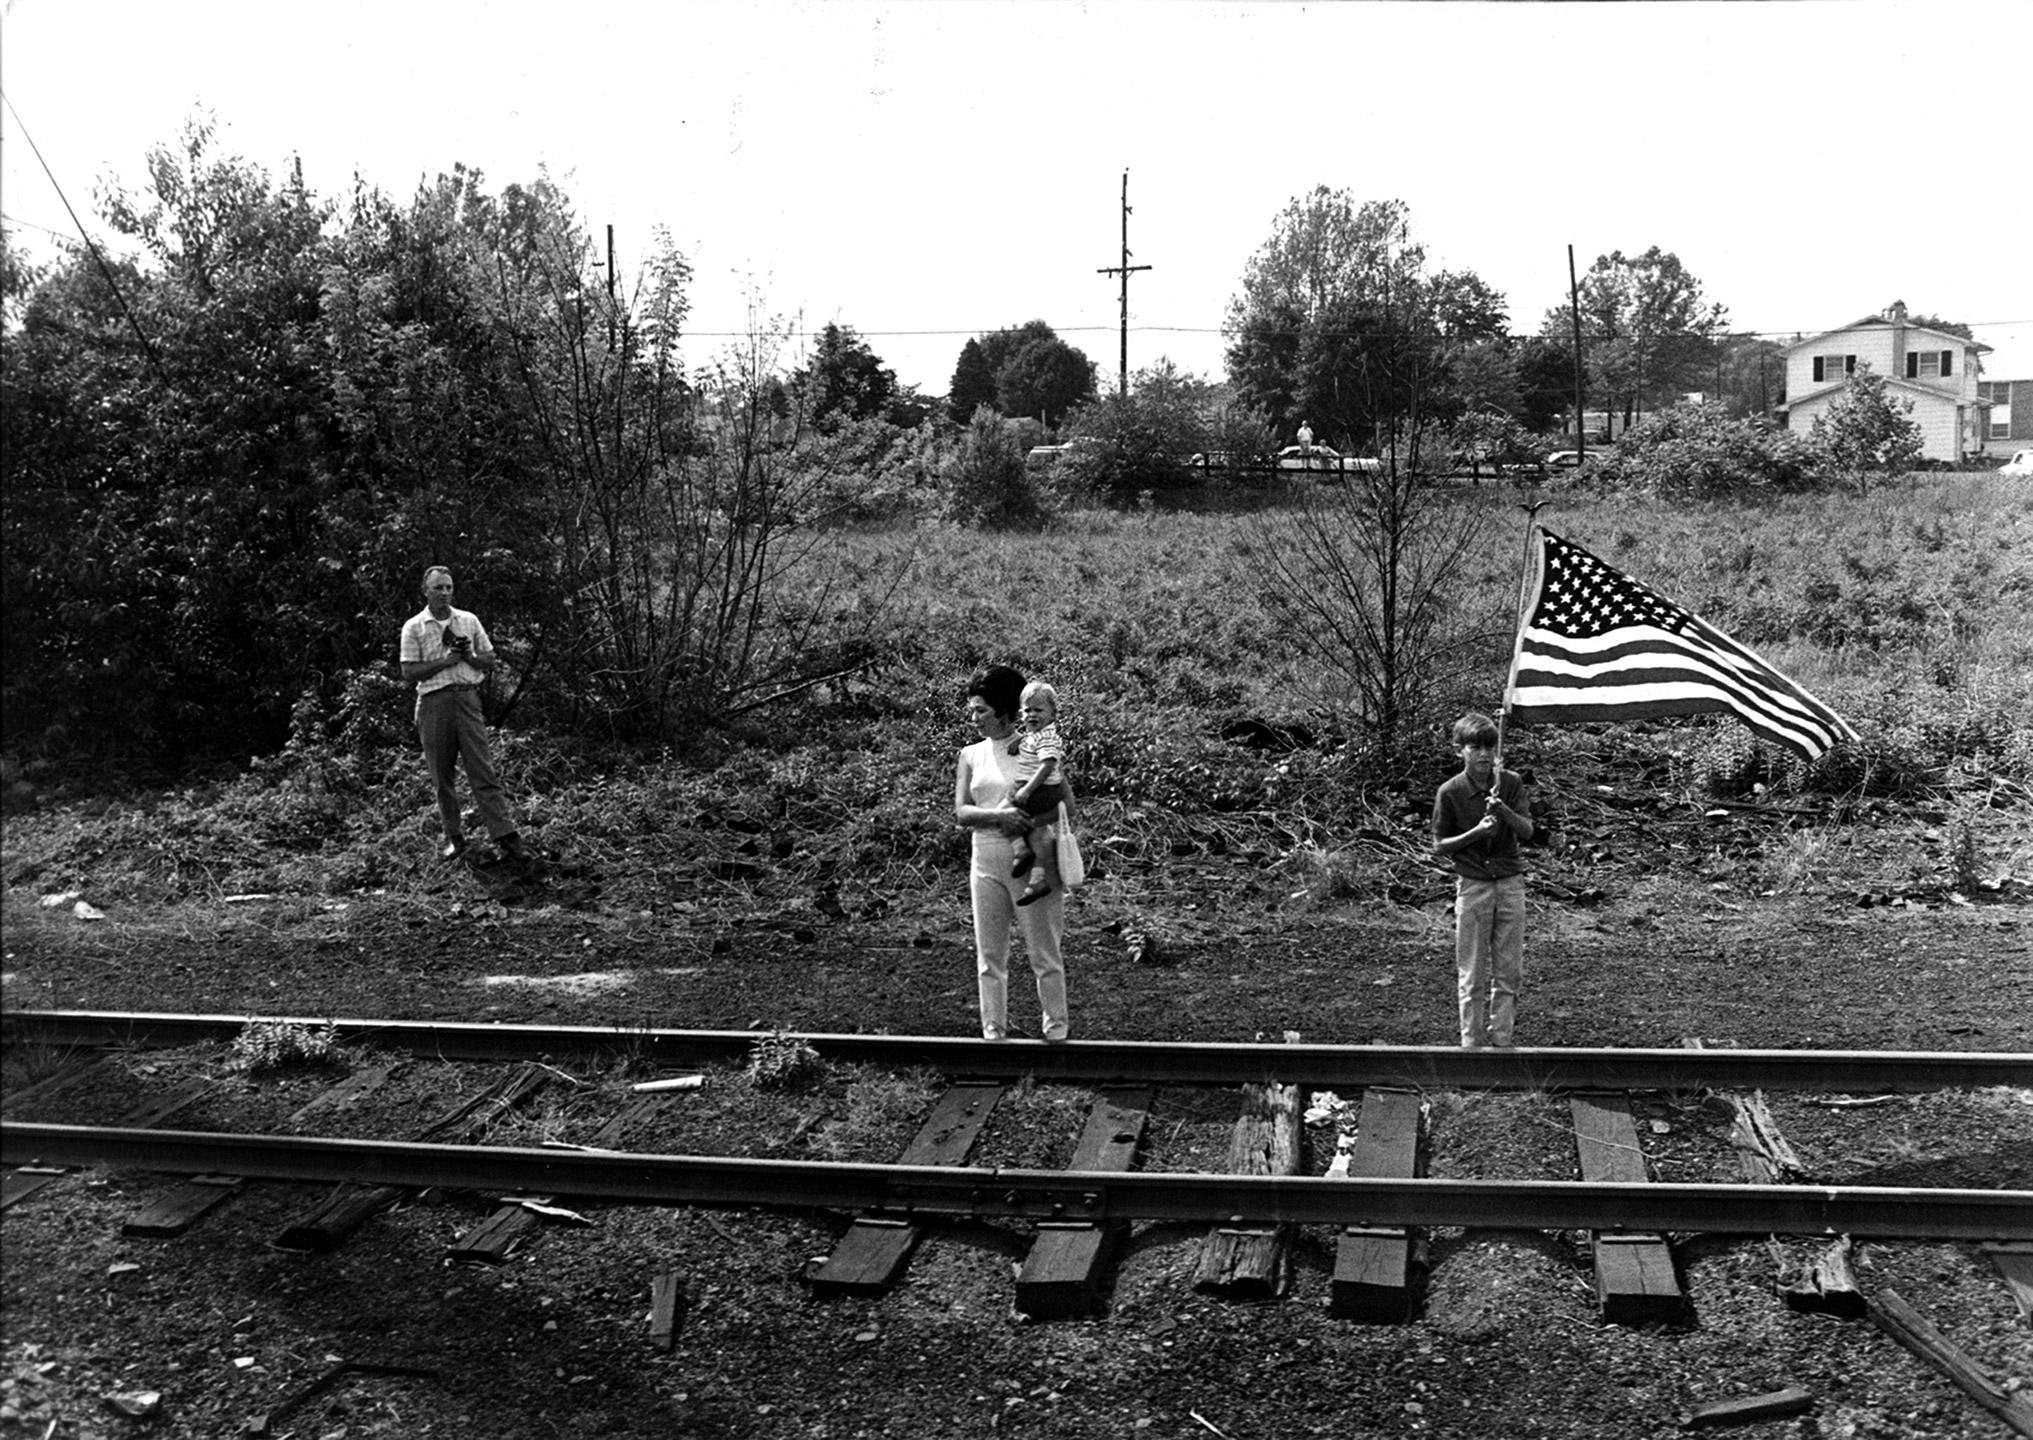 Senator Robert Kennedy's Funeral Train to Arlington, 1968.